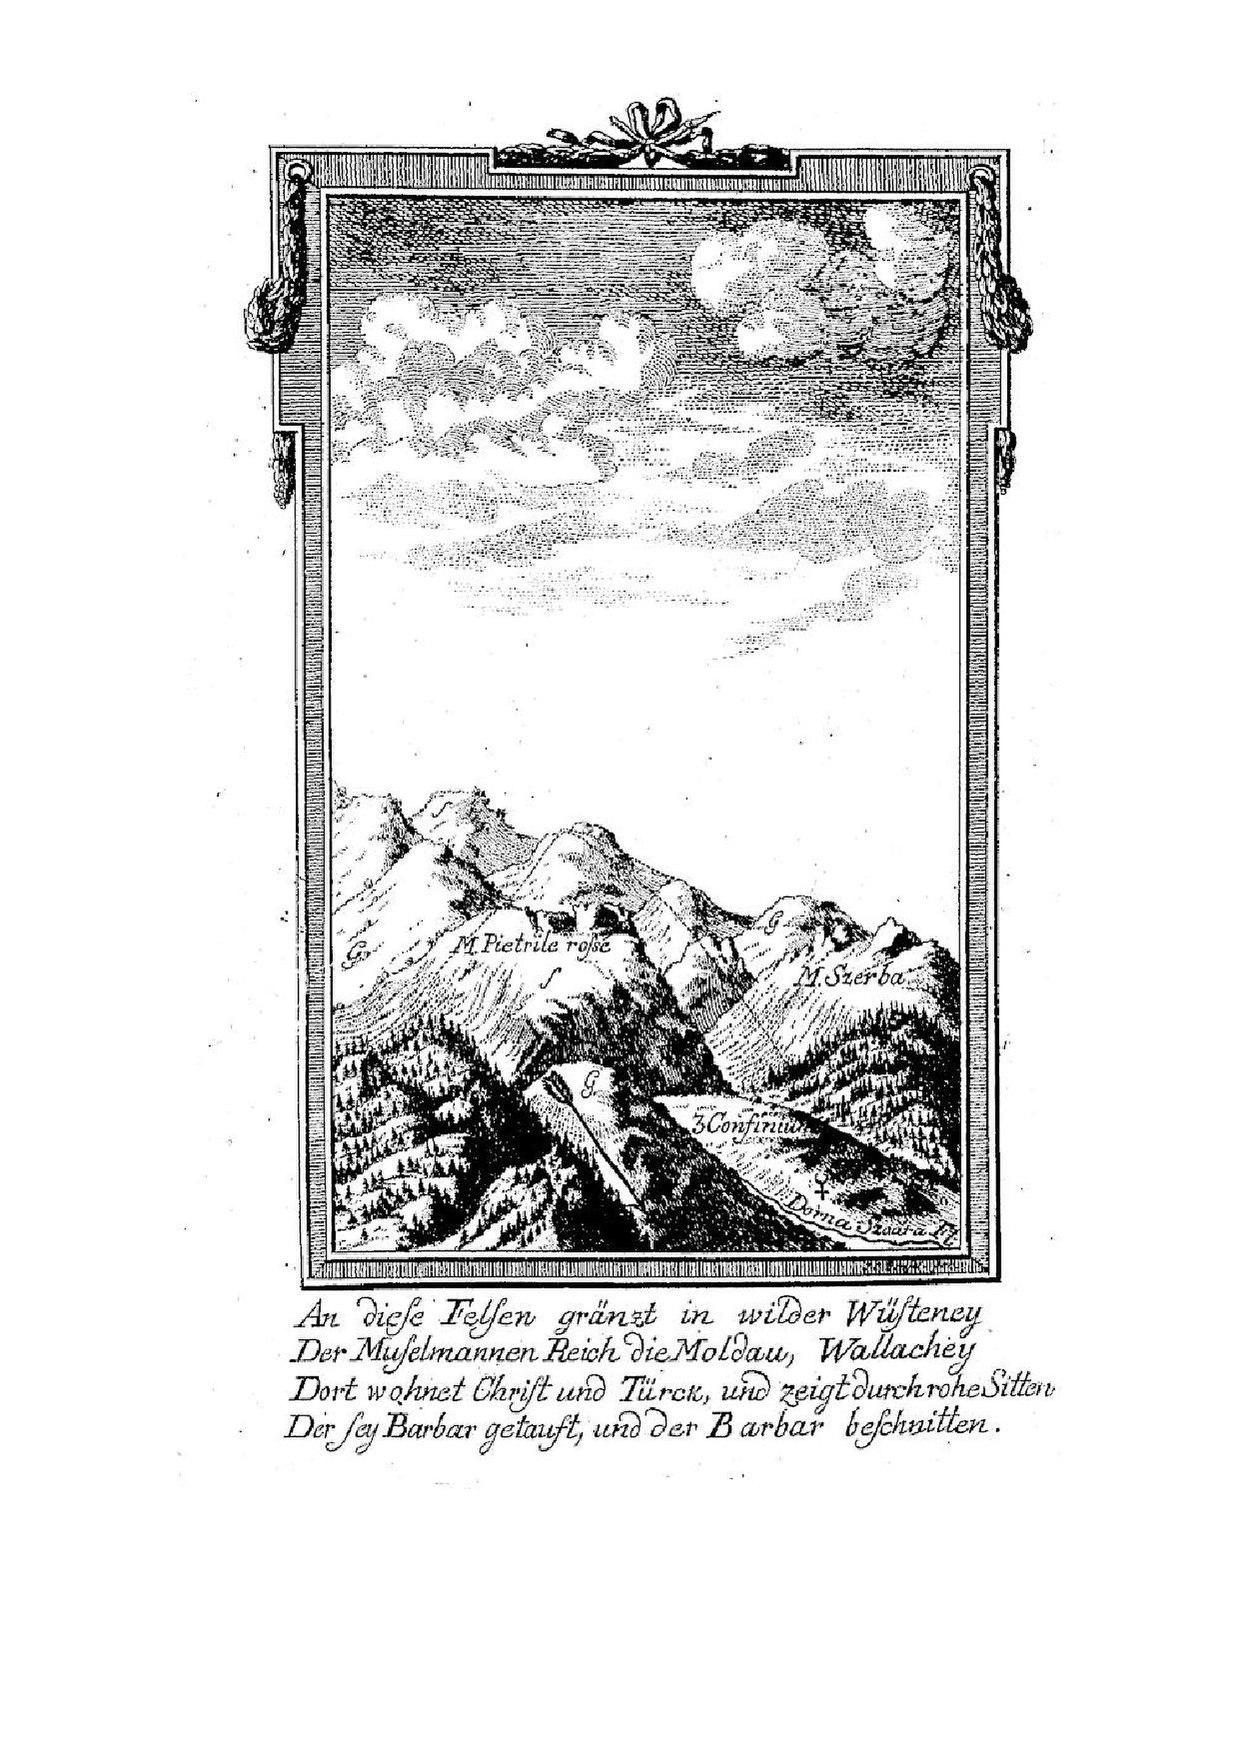 Filehacquet Balthasar 1791 Neueste Physikalisch Politische Original File 1239 X 1754 Pixels Size 211 Mb Mime